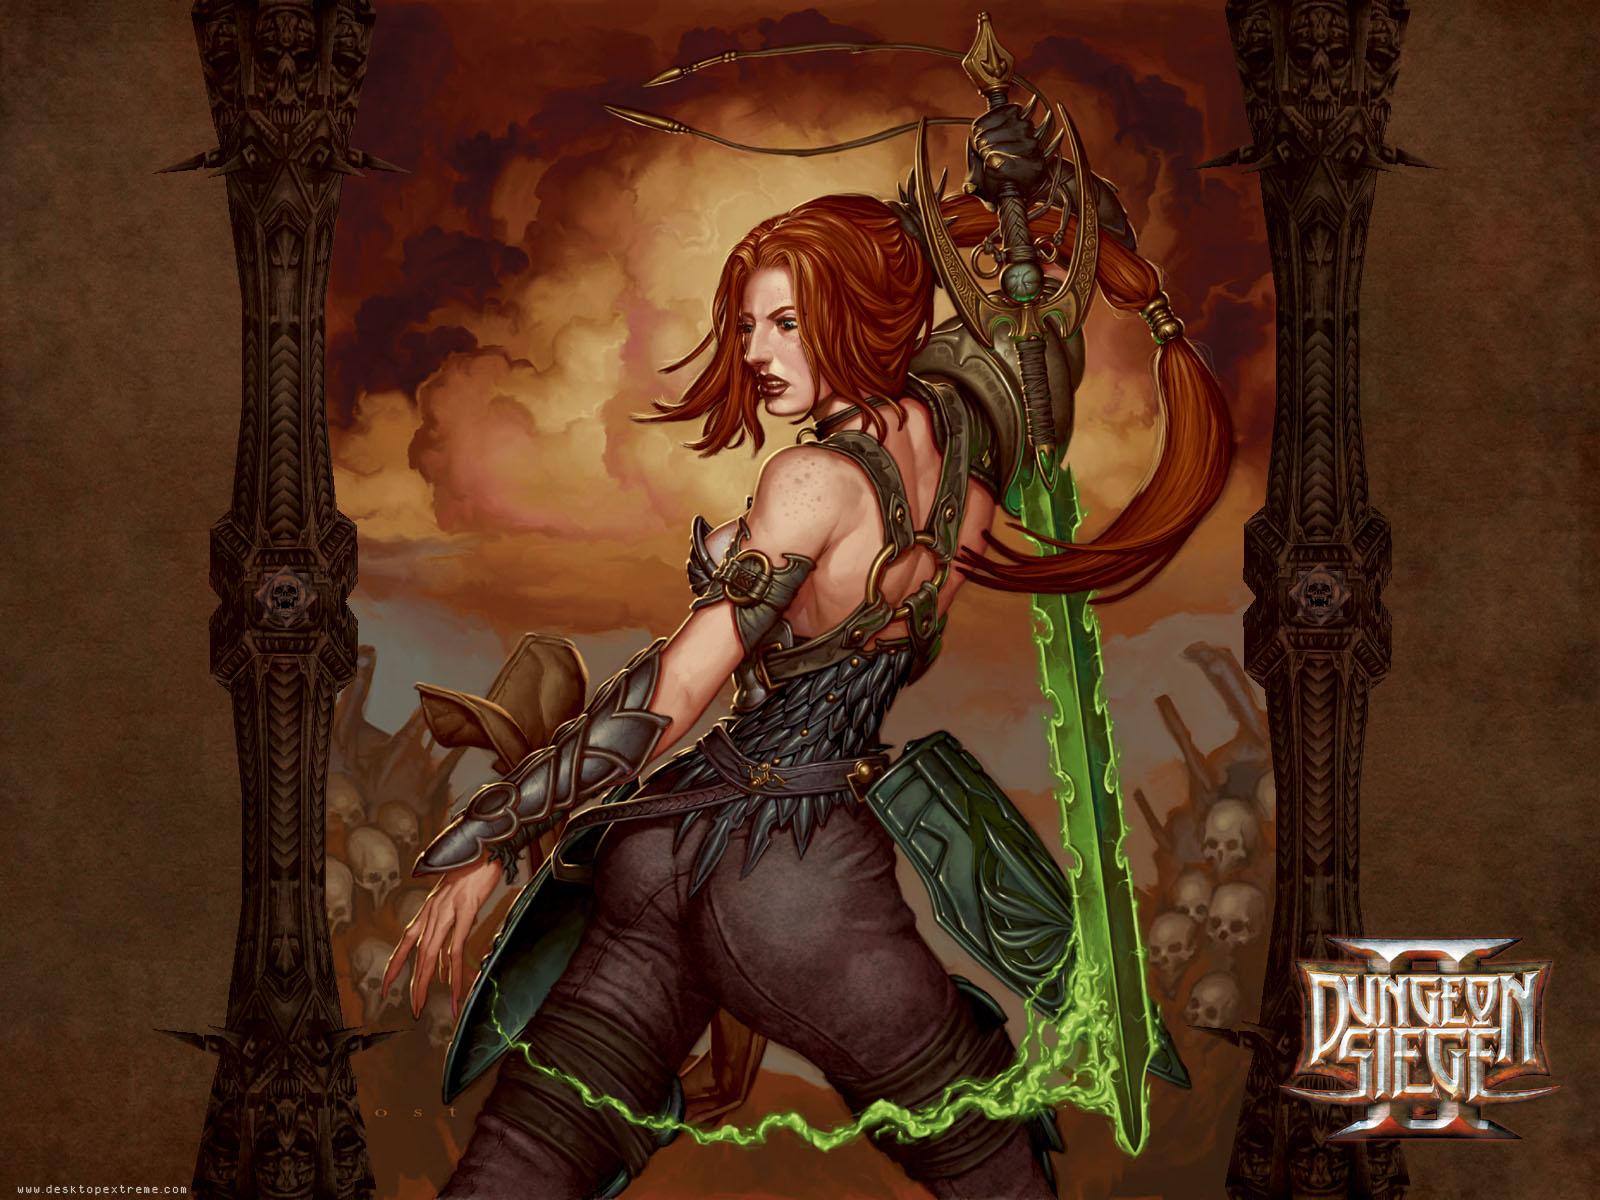 http://2.bp.blogspot.com/_TZOfOuEveHI/S6nhcitsc3I/AAAAAAAABSU/0dWVDoFbUBg/s1600/Dungeon_Siege_II-wallpaper.jpg